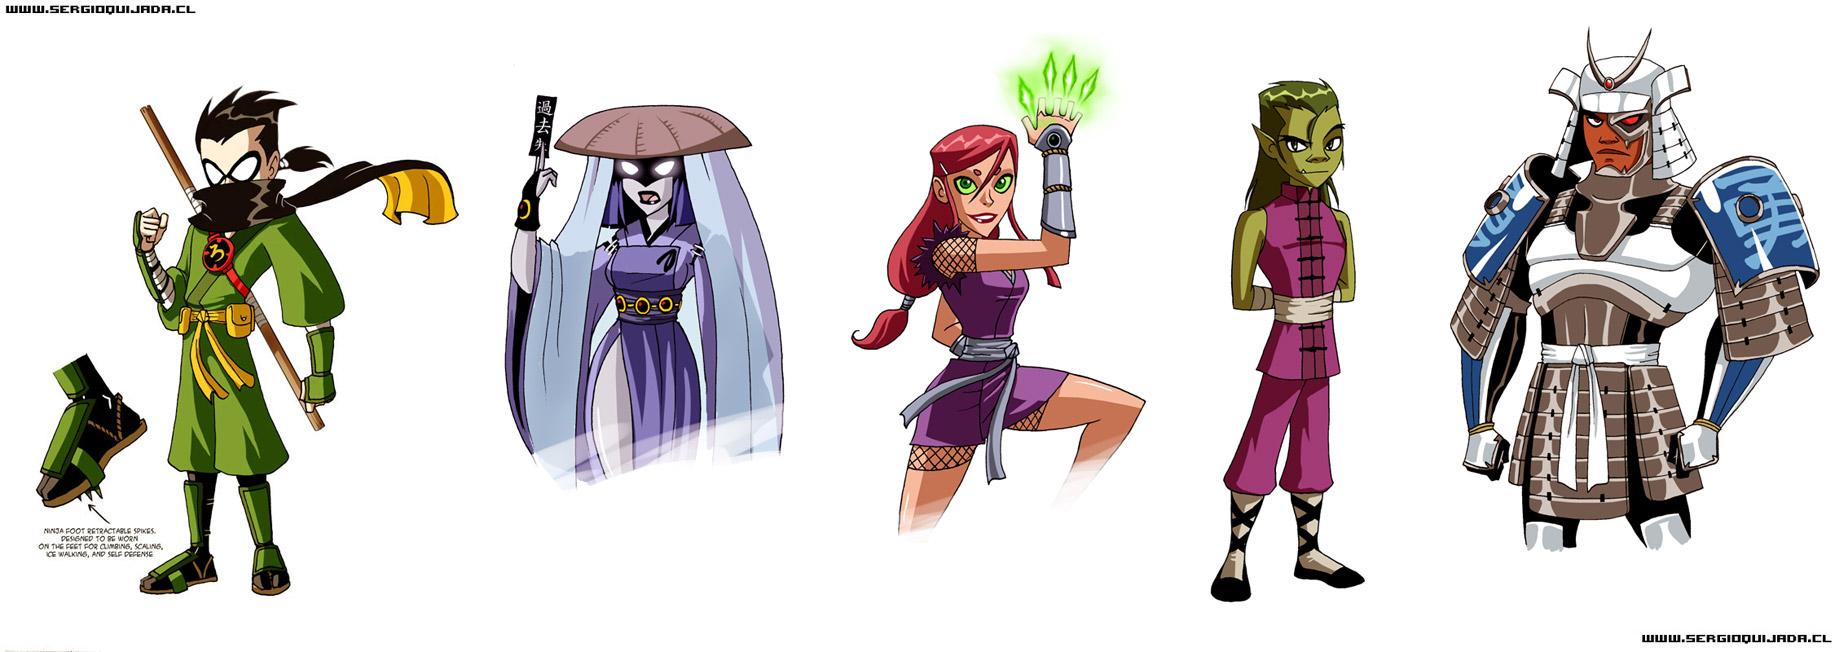 - Teen Titans - EDO Period by sergio-quijada